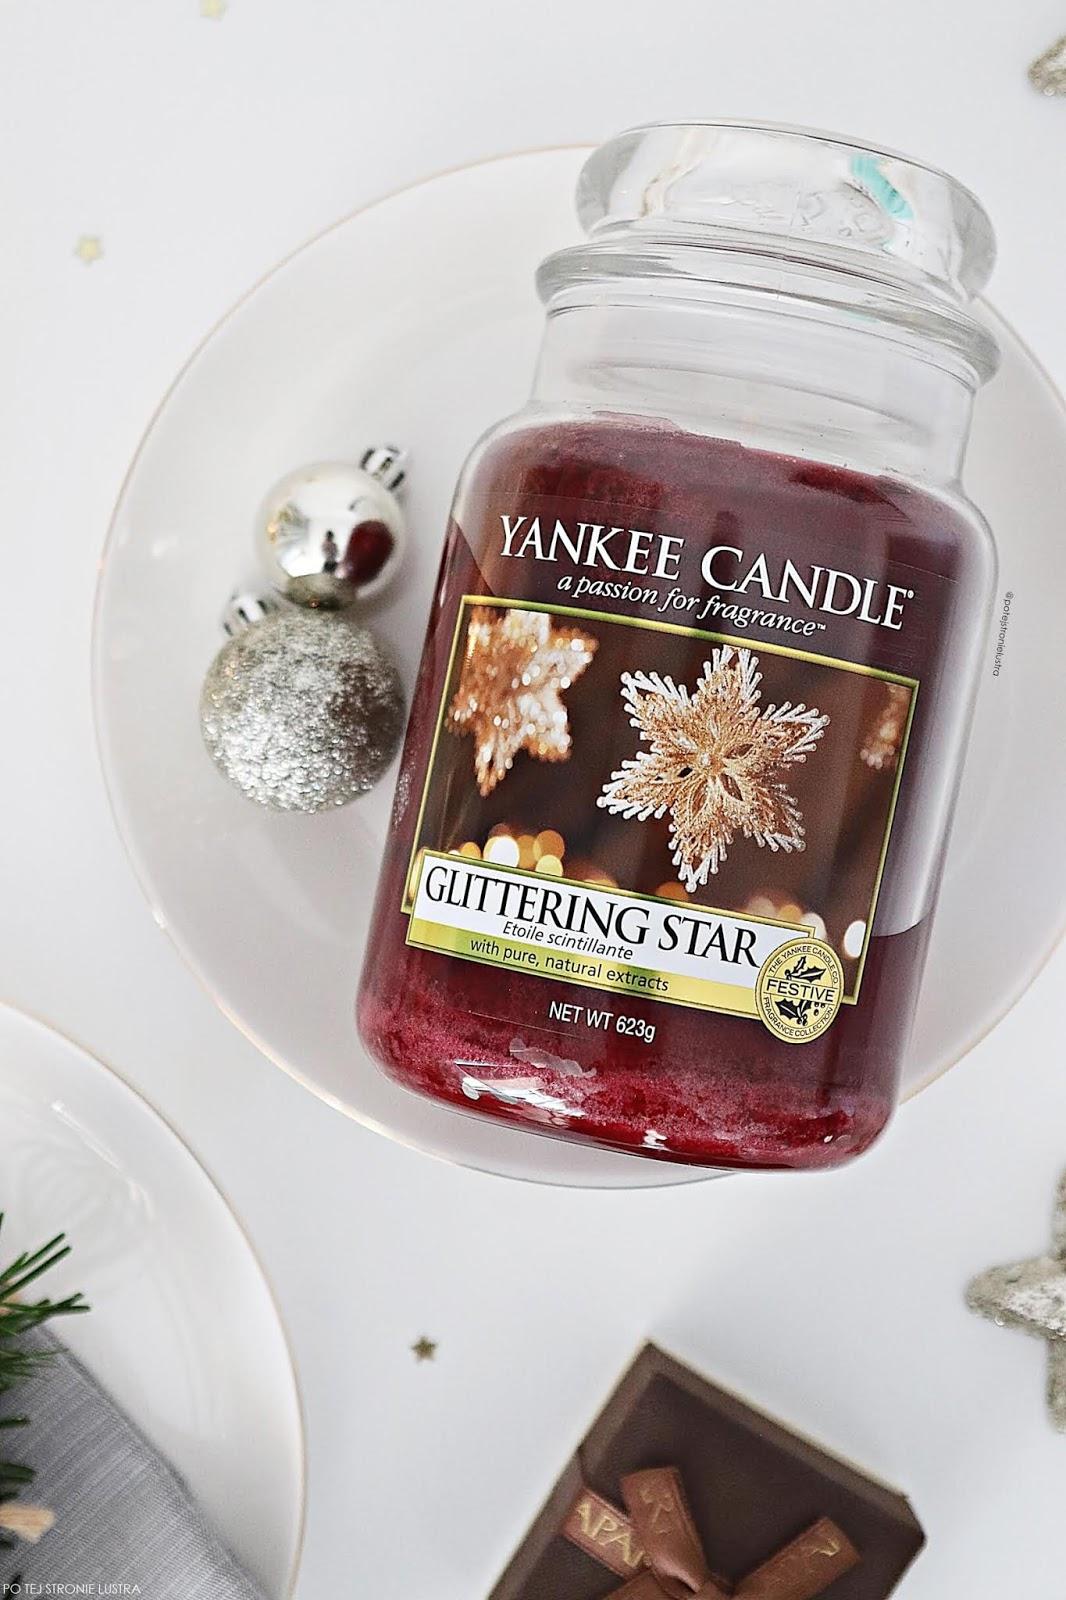 yankee candle glittering star blog recenzja